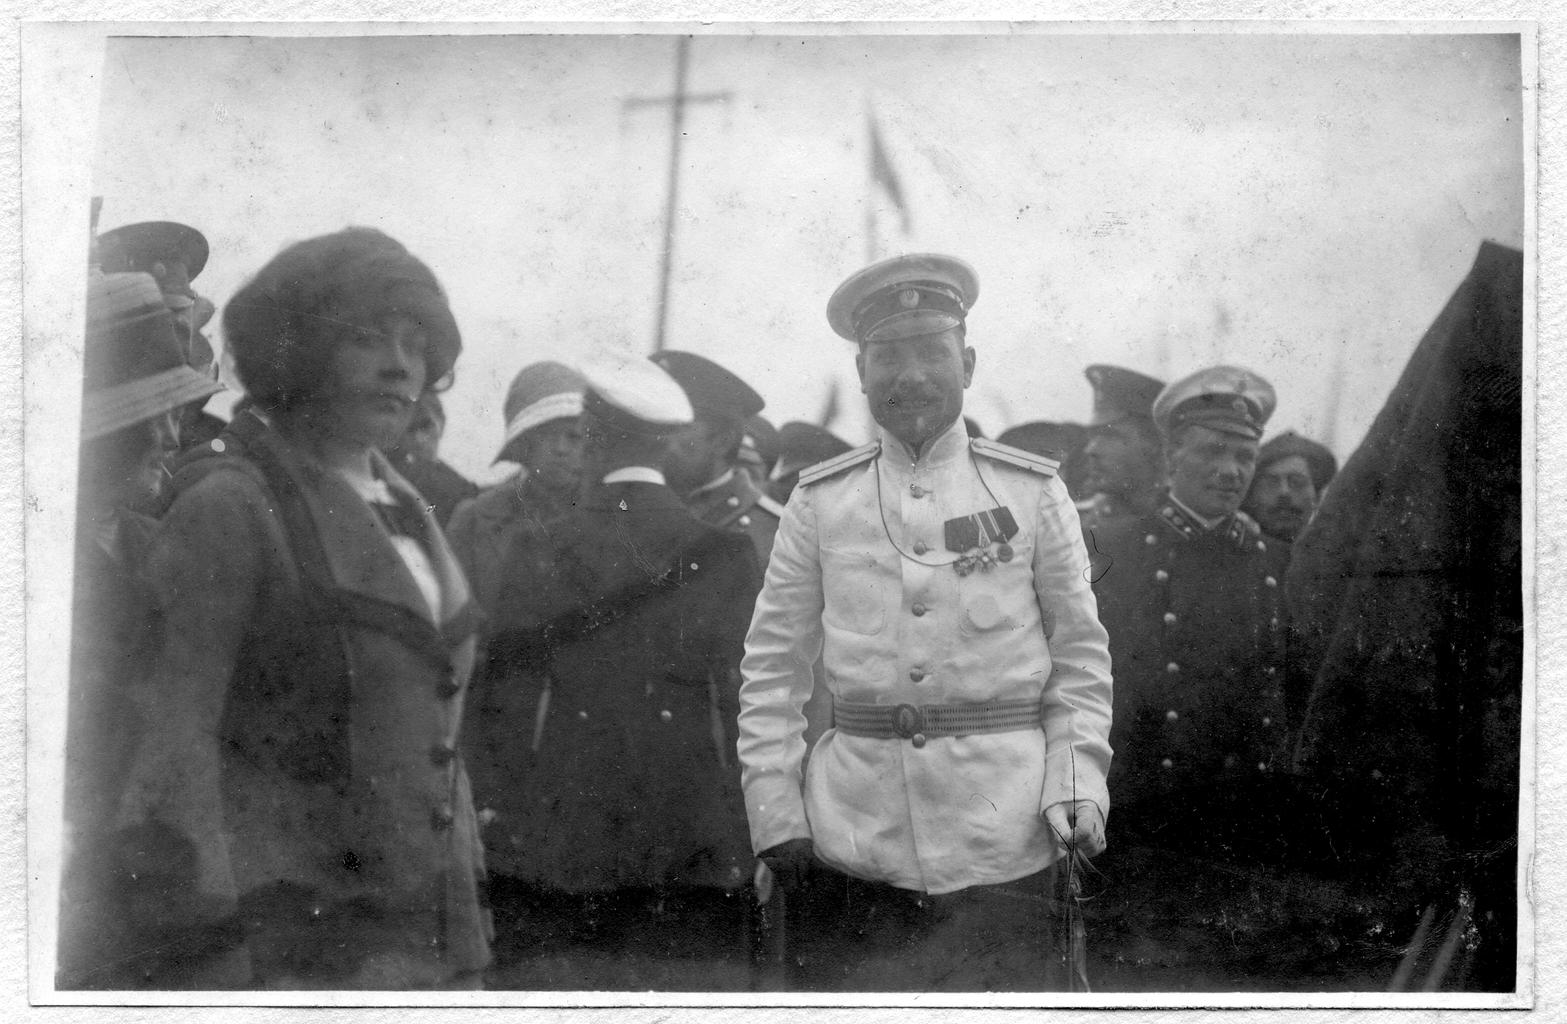 Седов Г. Я. с провожающими и участниками экспедиции на палубе судна